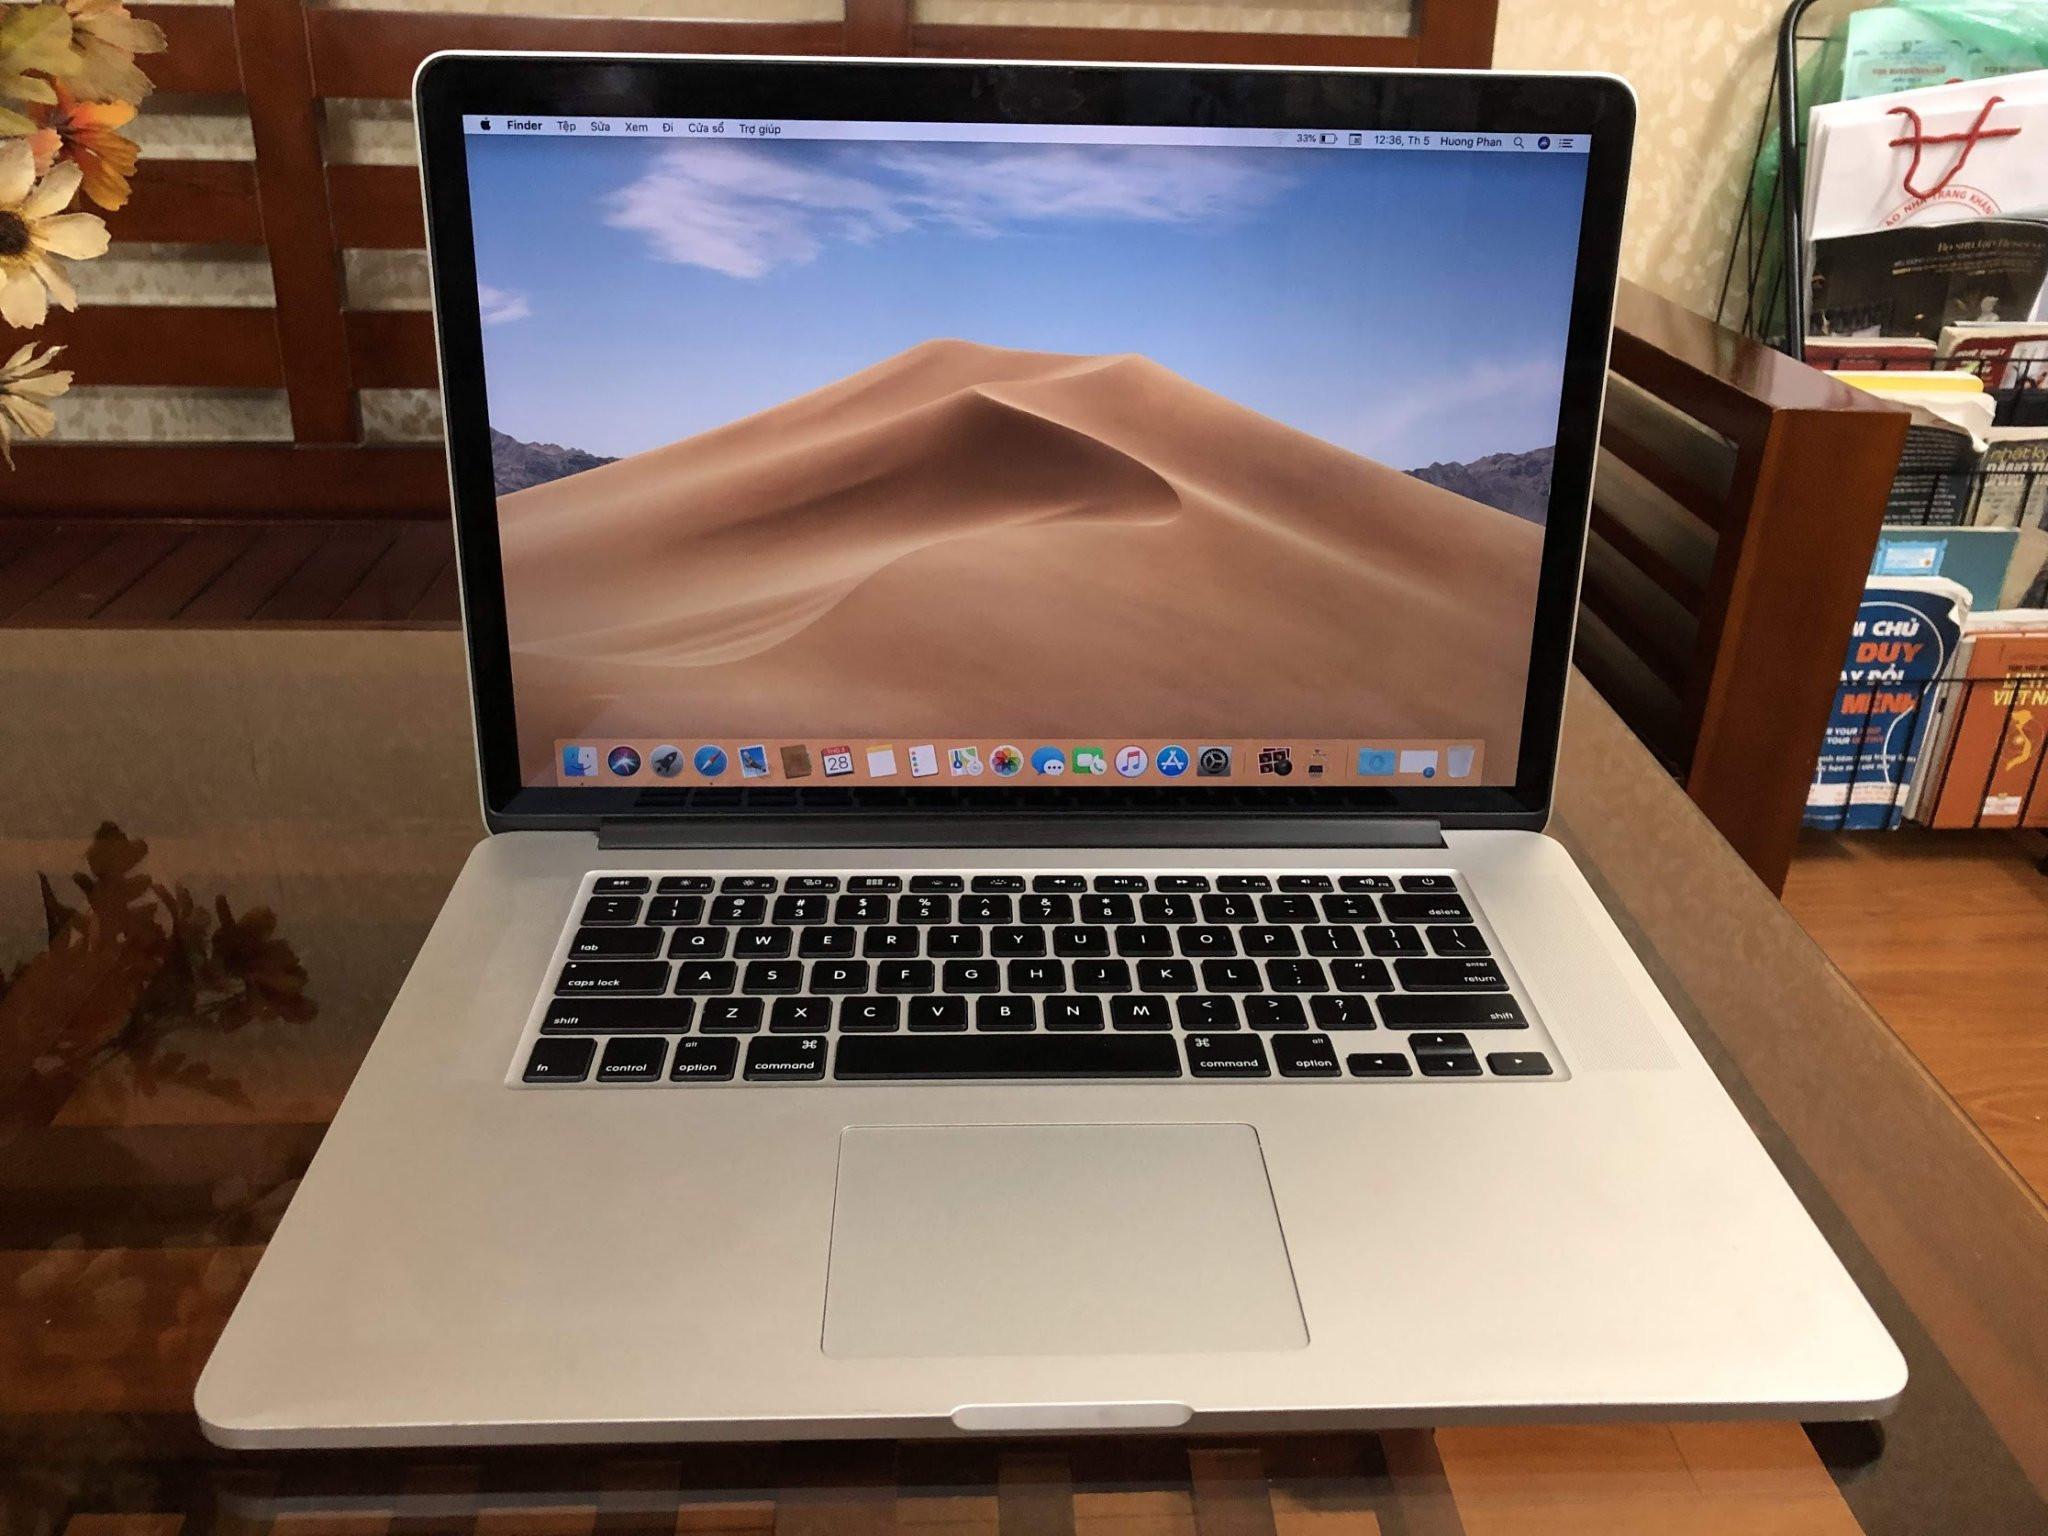 Macbook Pro 2014 15inch, Core i7/16Gb/512Gb